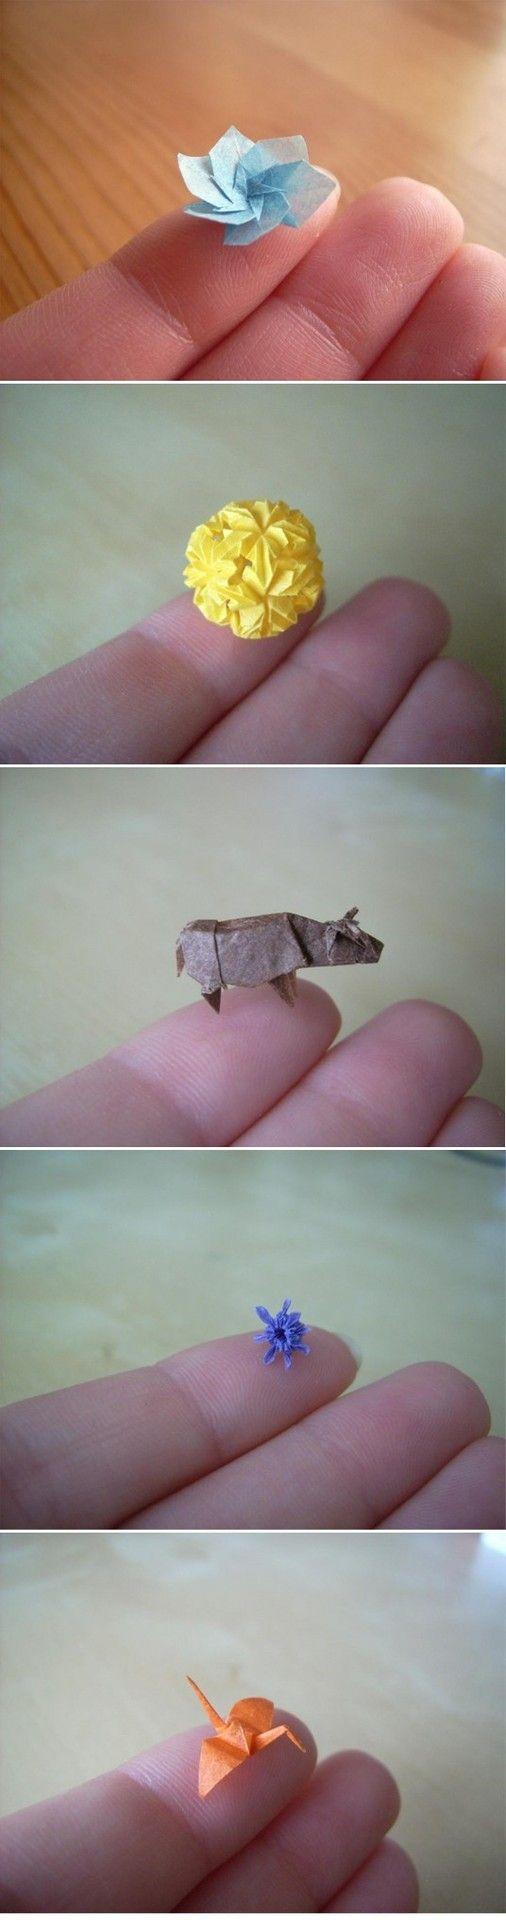 iheartminiatures:    Mini origami.